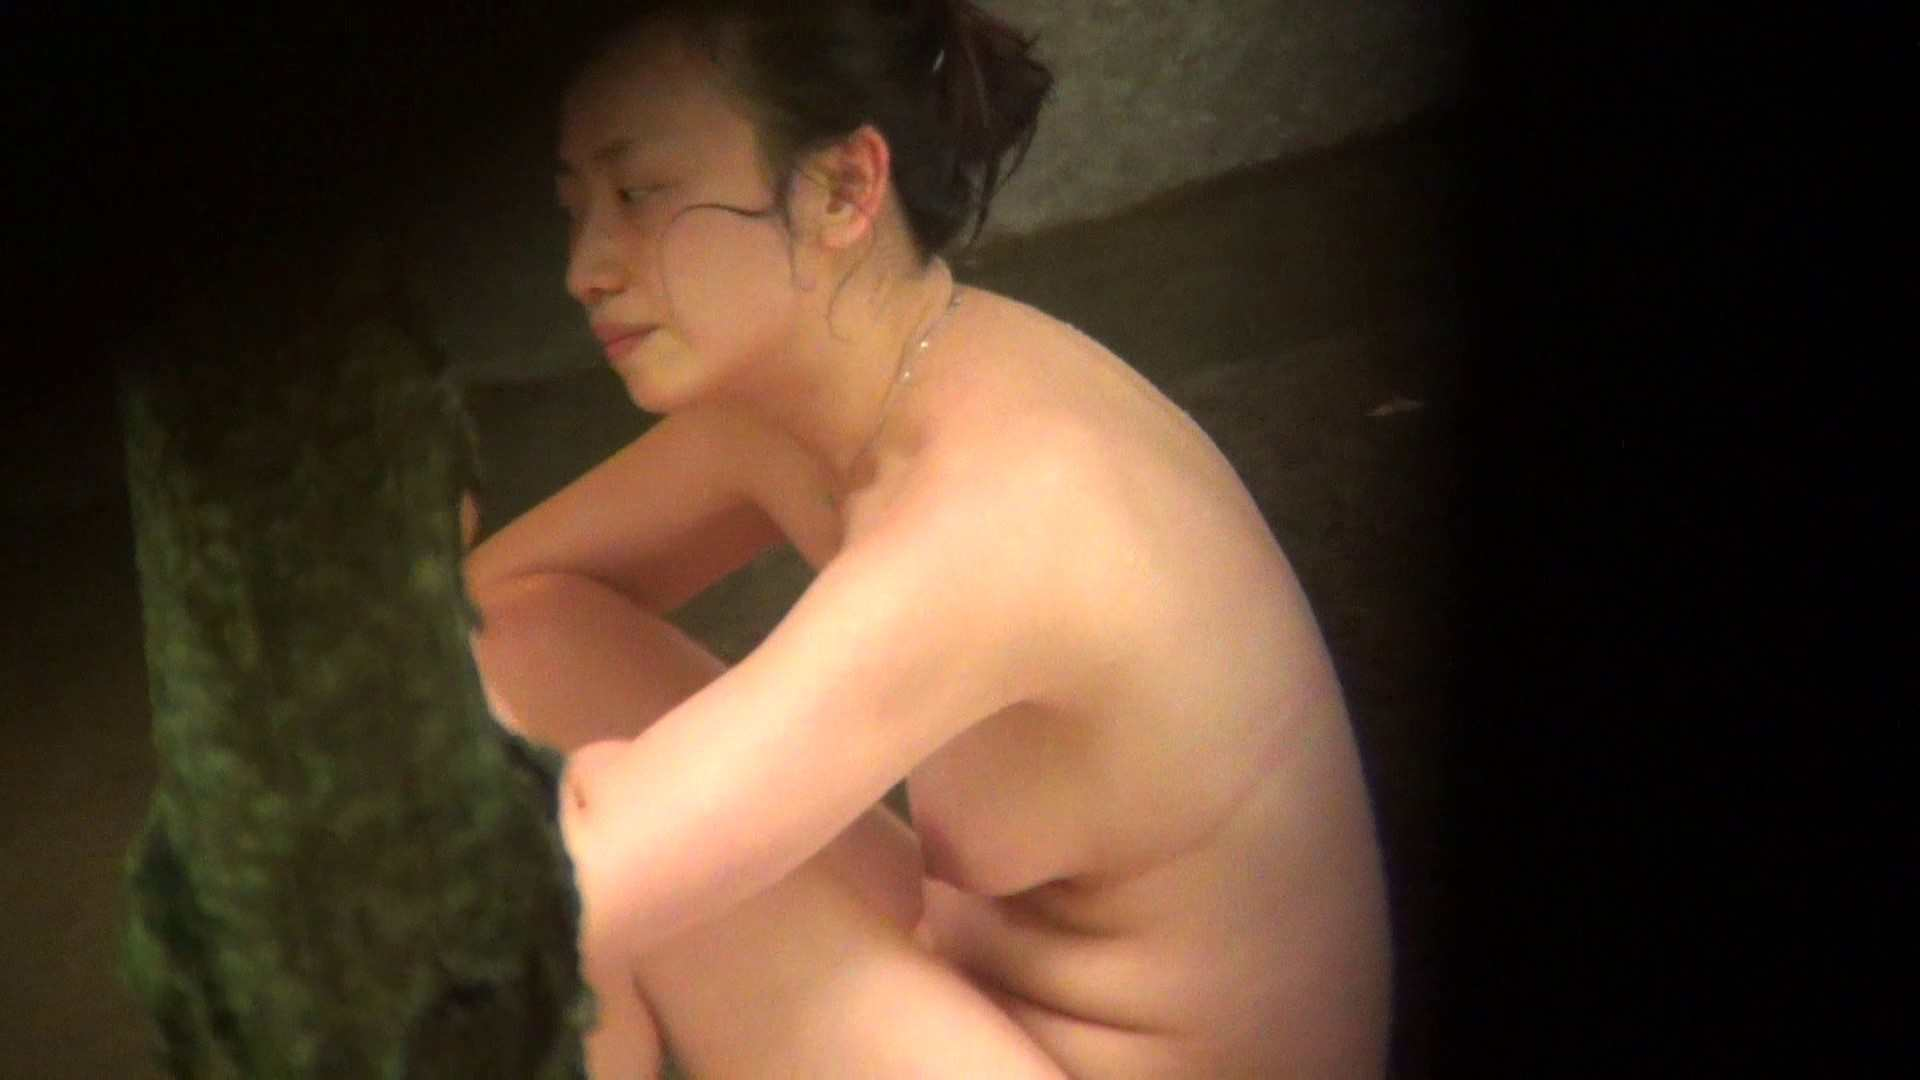 Vol.80 出産経験済みの弛んだ肉体と大胆すぎるアングル 美女 濡れ場動画紹介 79枚 67